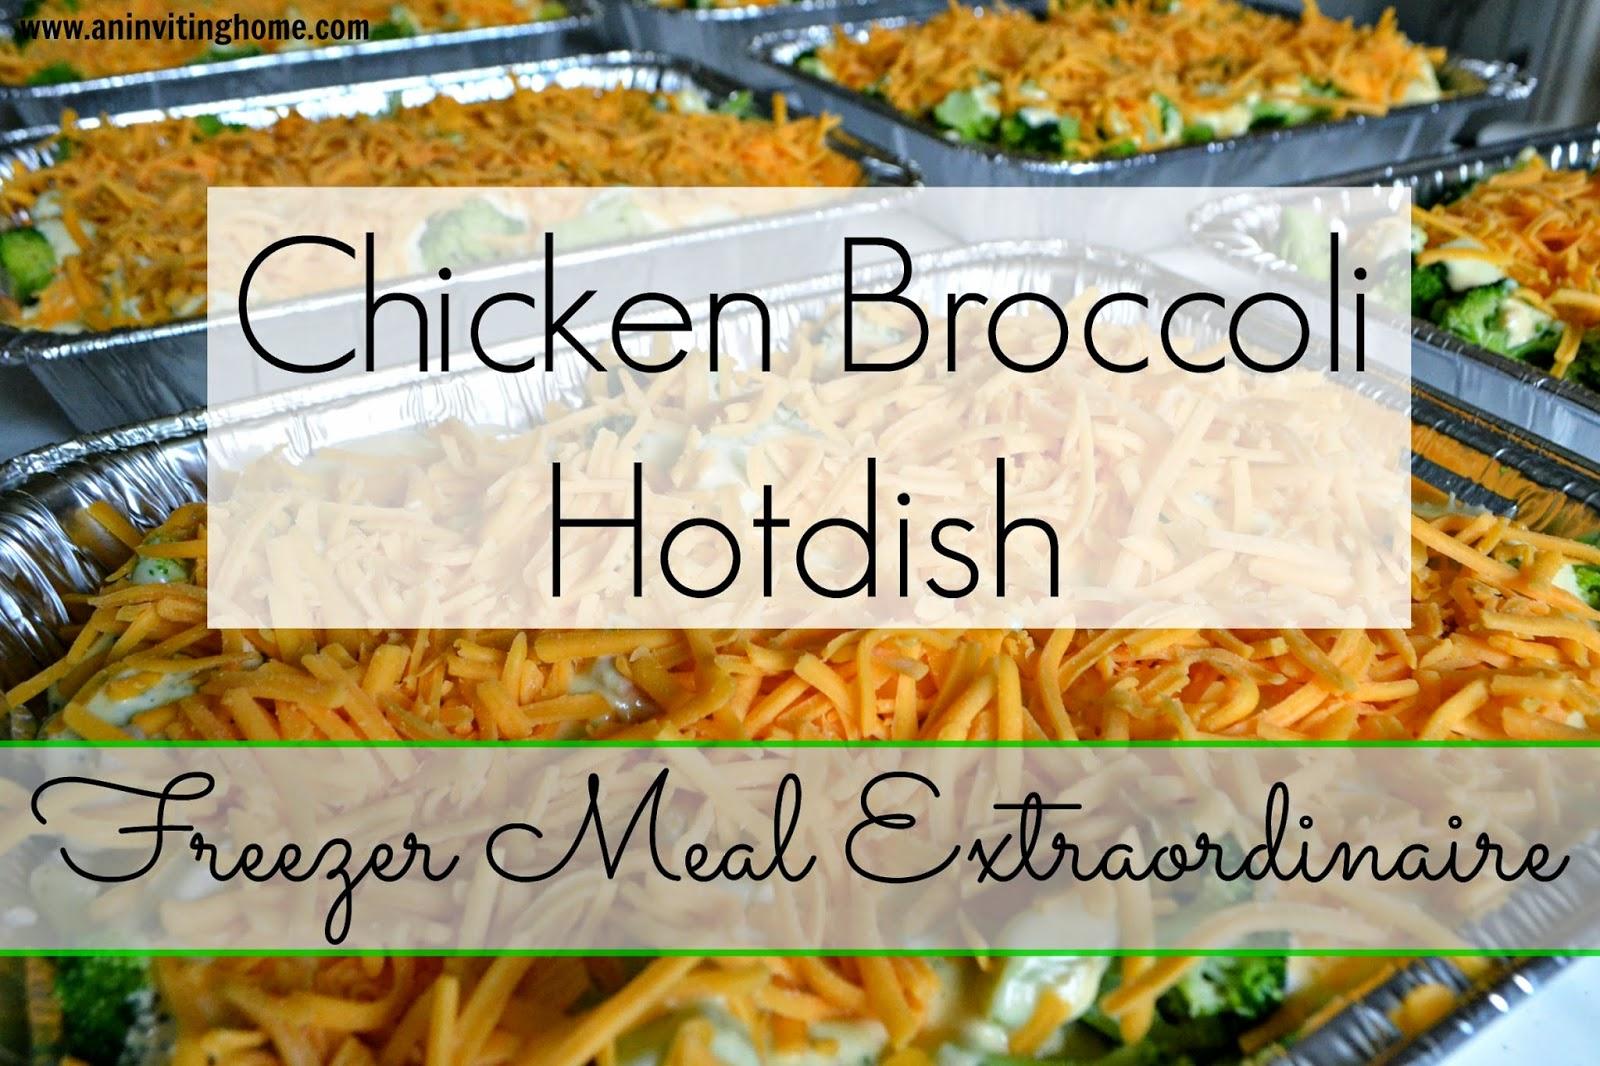 Chicken Broccoli Hotdish Freezer Meal